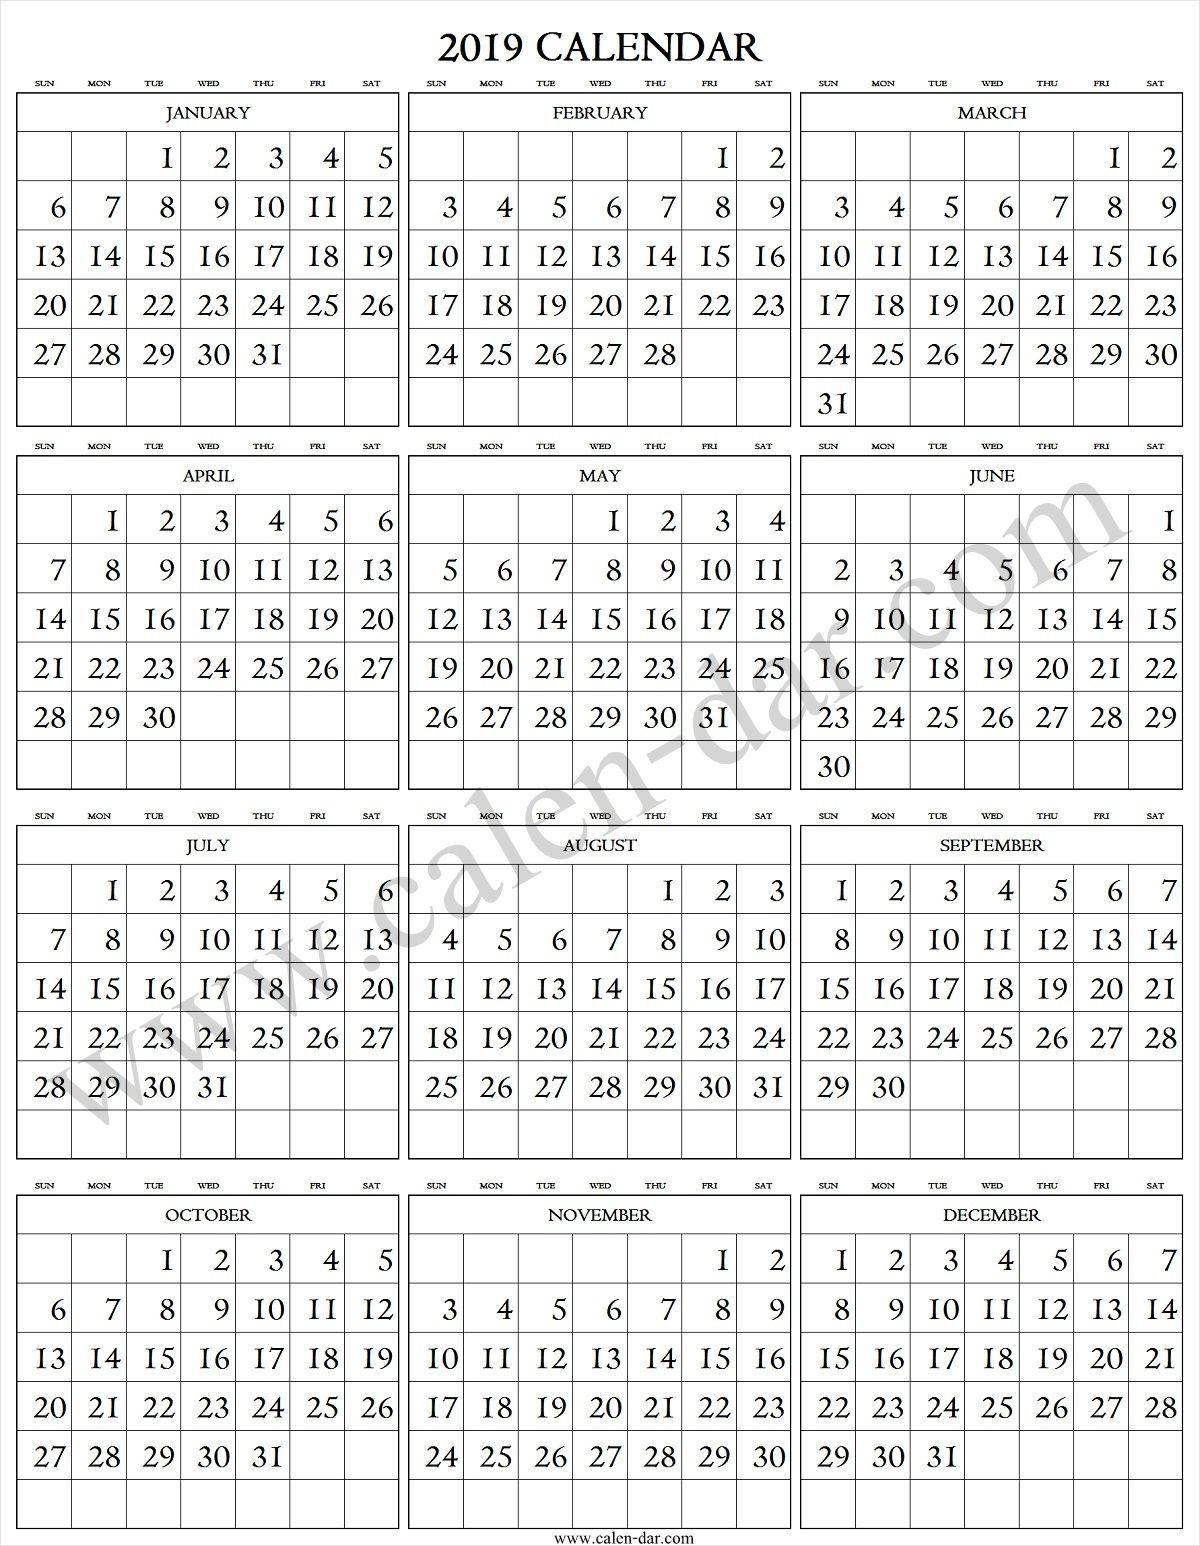 2019 Calendar Large Numbers Calendar 2019 Large Number Numbers